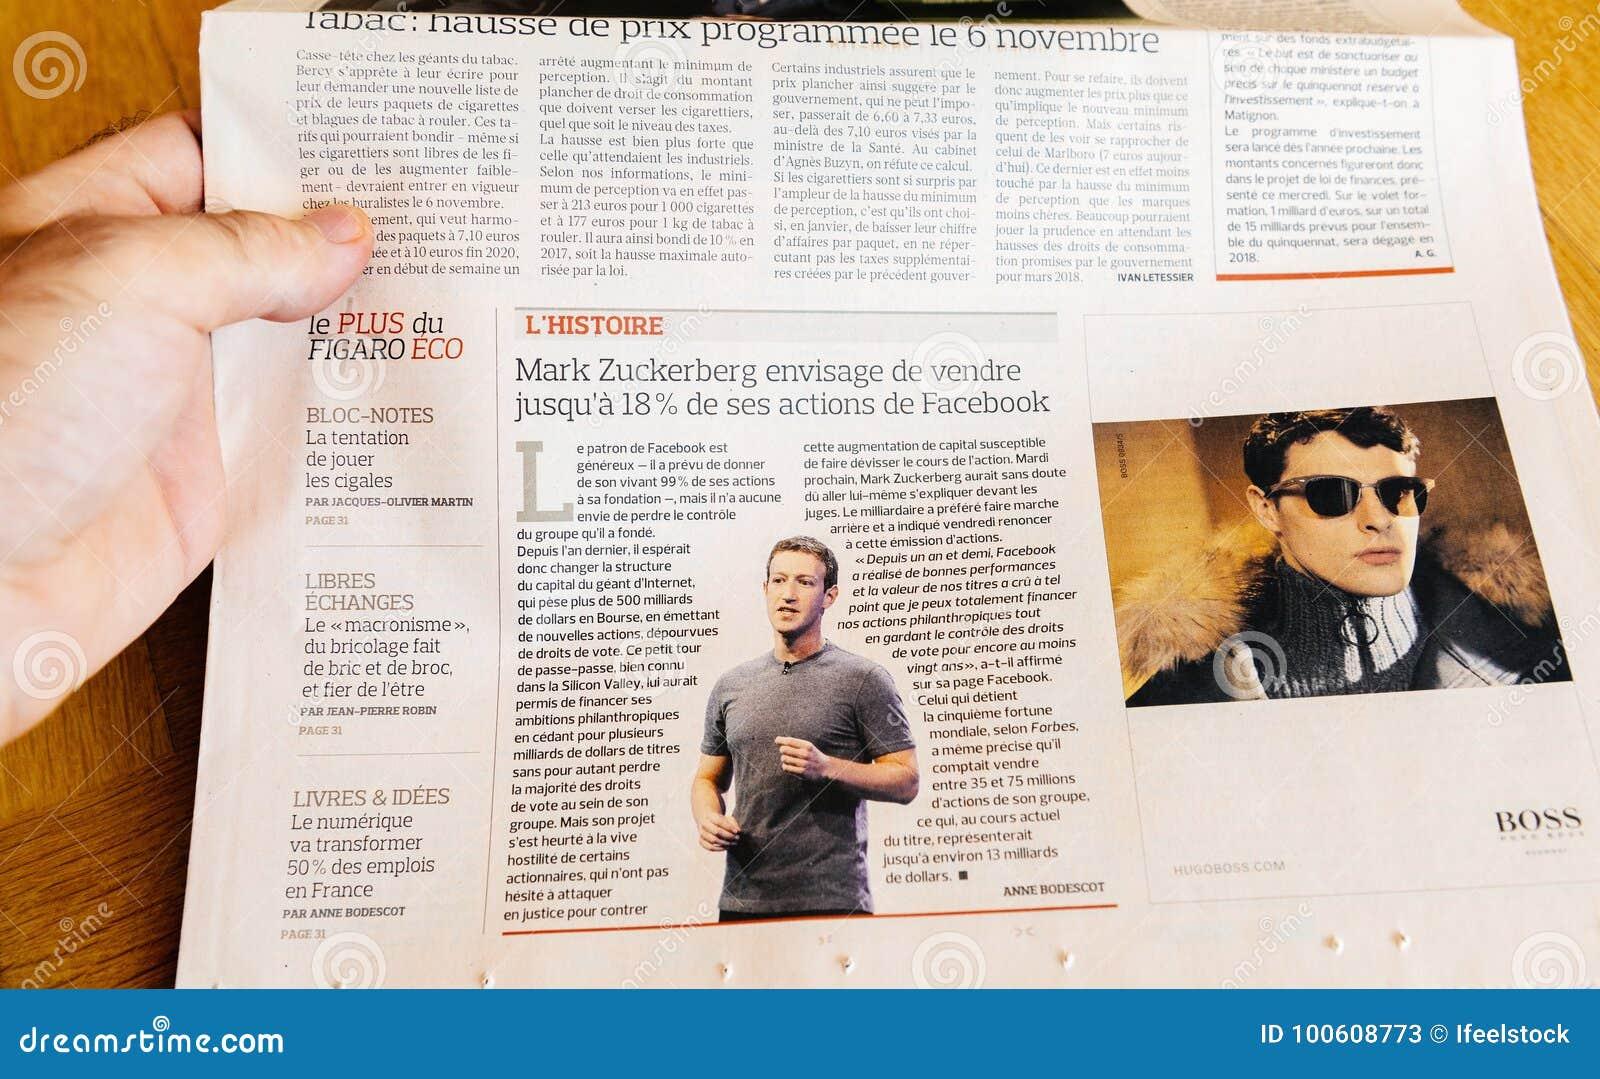 Man Reading Newspaper Zuckerberg Facebook CEO Intention To